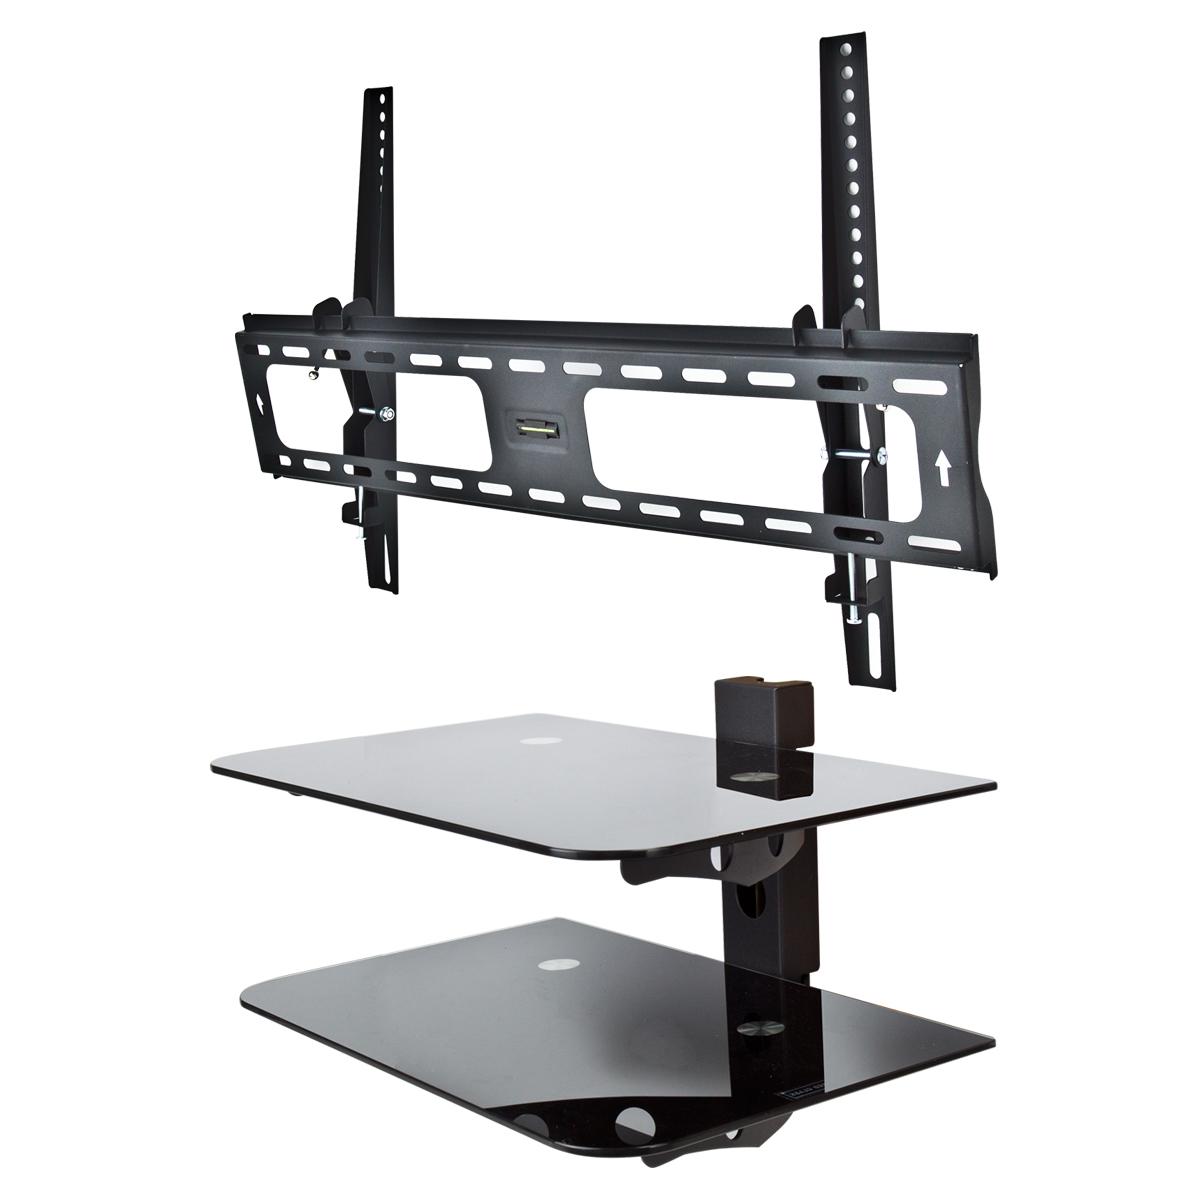 tilt tv wall mount flat bracket 30 60 component shelf 2 tier av dvd stand ebay. Black Bedroom Furniture Sets. Home Design Ideas